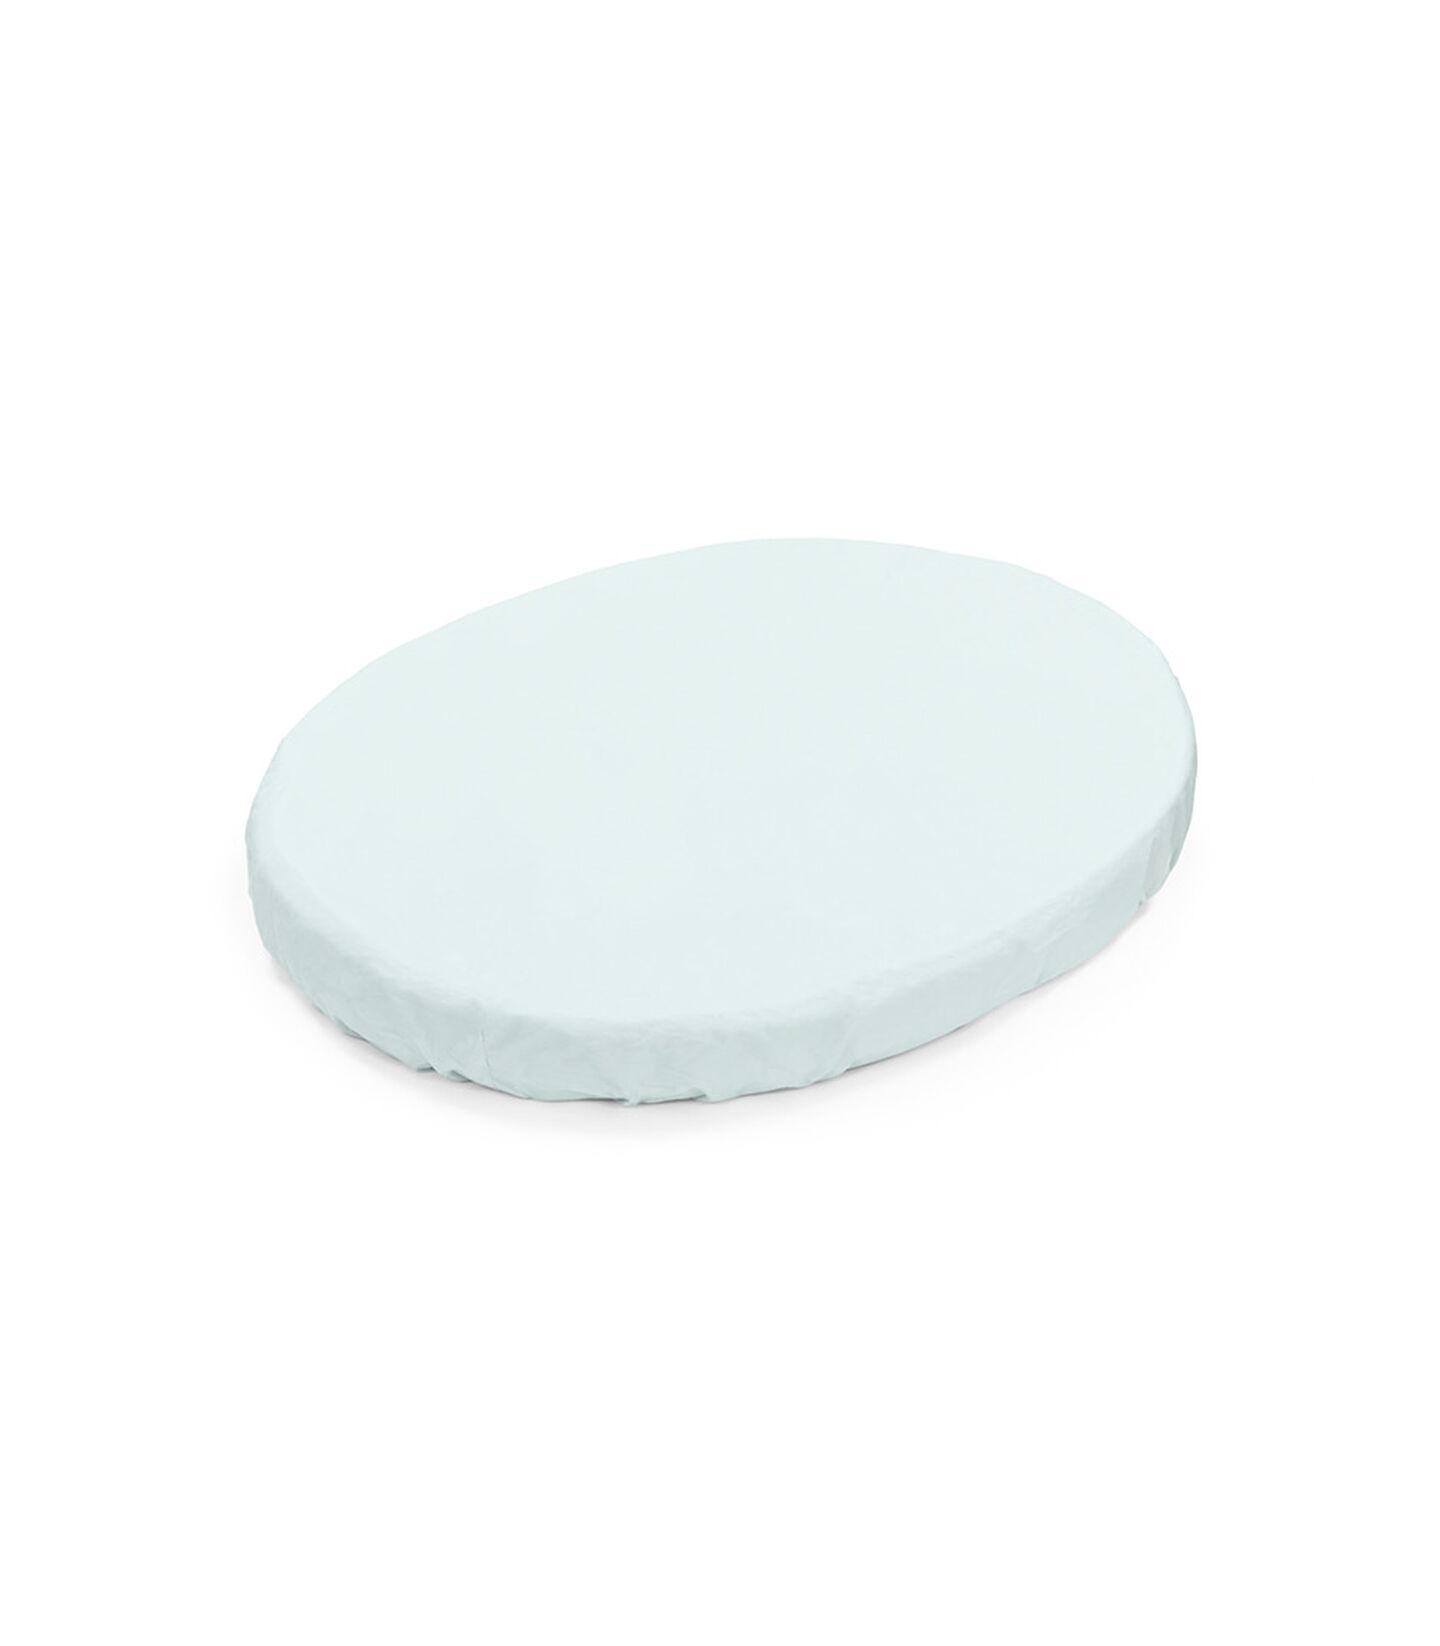 Stokke® Sleepi™ Mini dra-på-lakan, Powder Blue, Powder Blue, mainview view 1